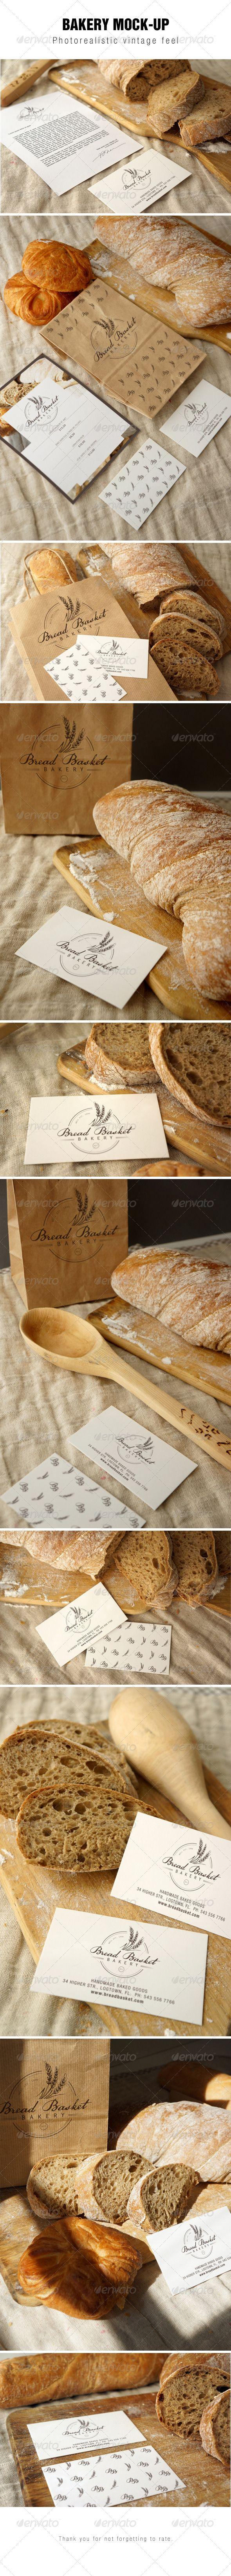 Bakery Branding Mockup (Stationery) combo